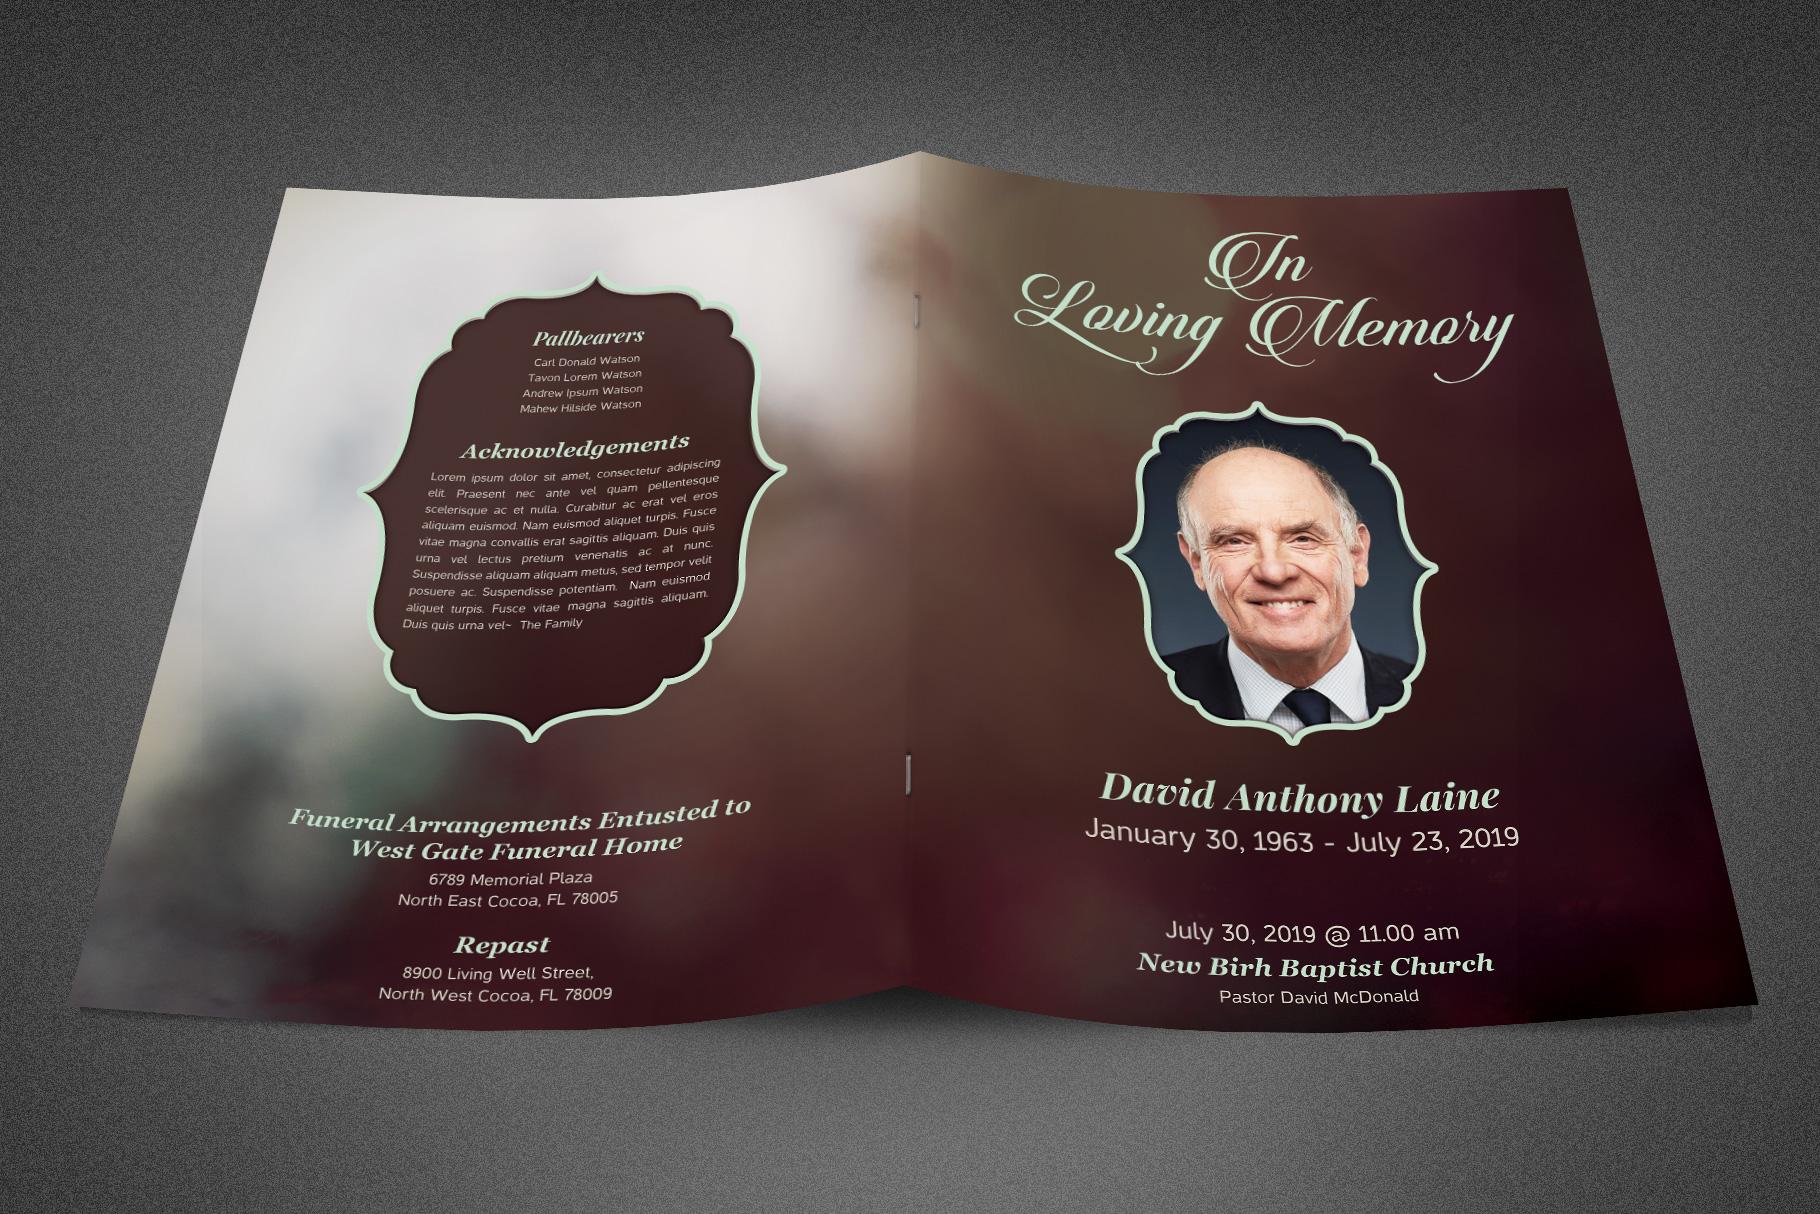 In Loving Memory Funeral Program example image 2